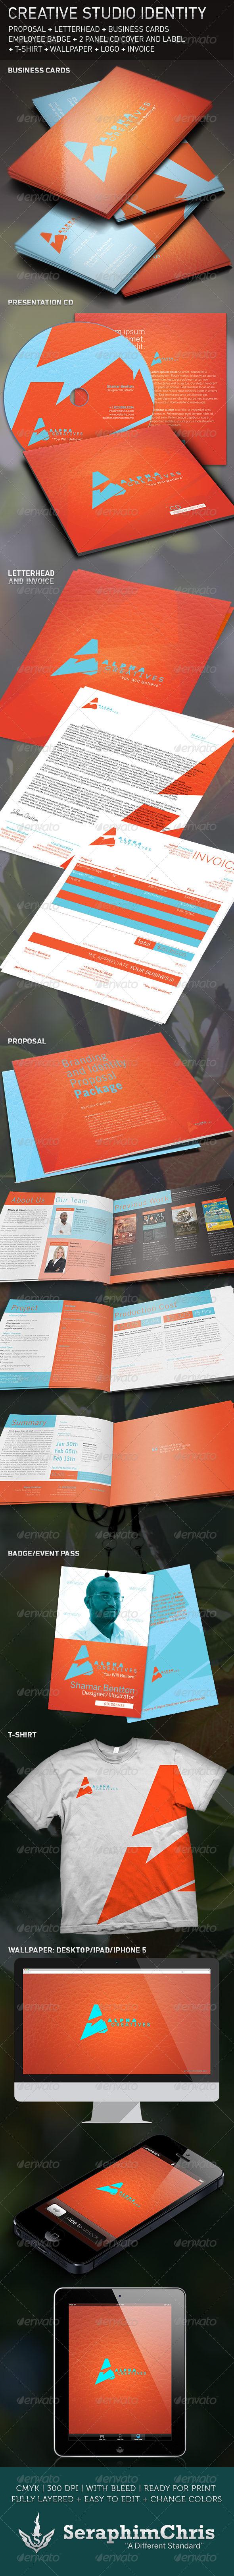 GraphicRiver Creative Studio Brand Identity Template 5309776